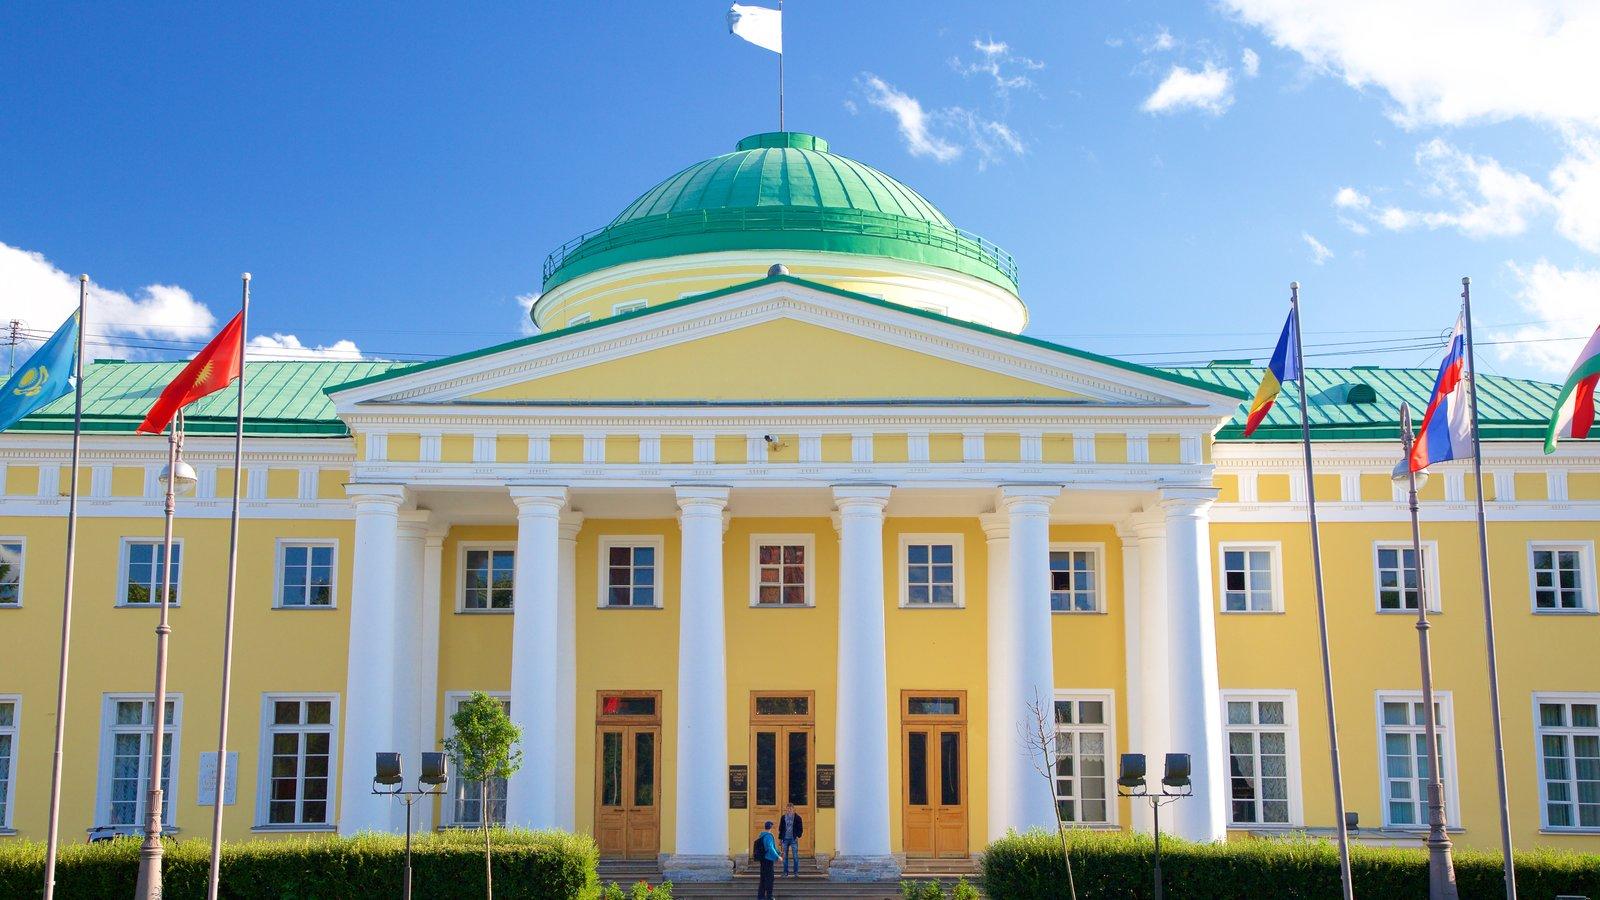 Palácio Tauride que inclui arquitetura de patrimônio